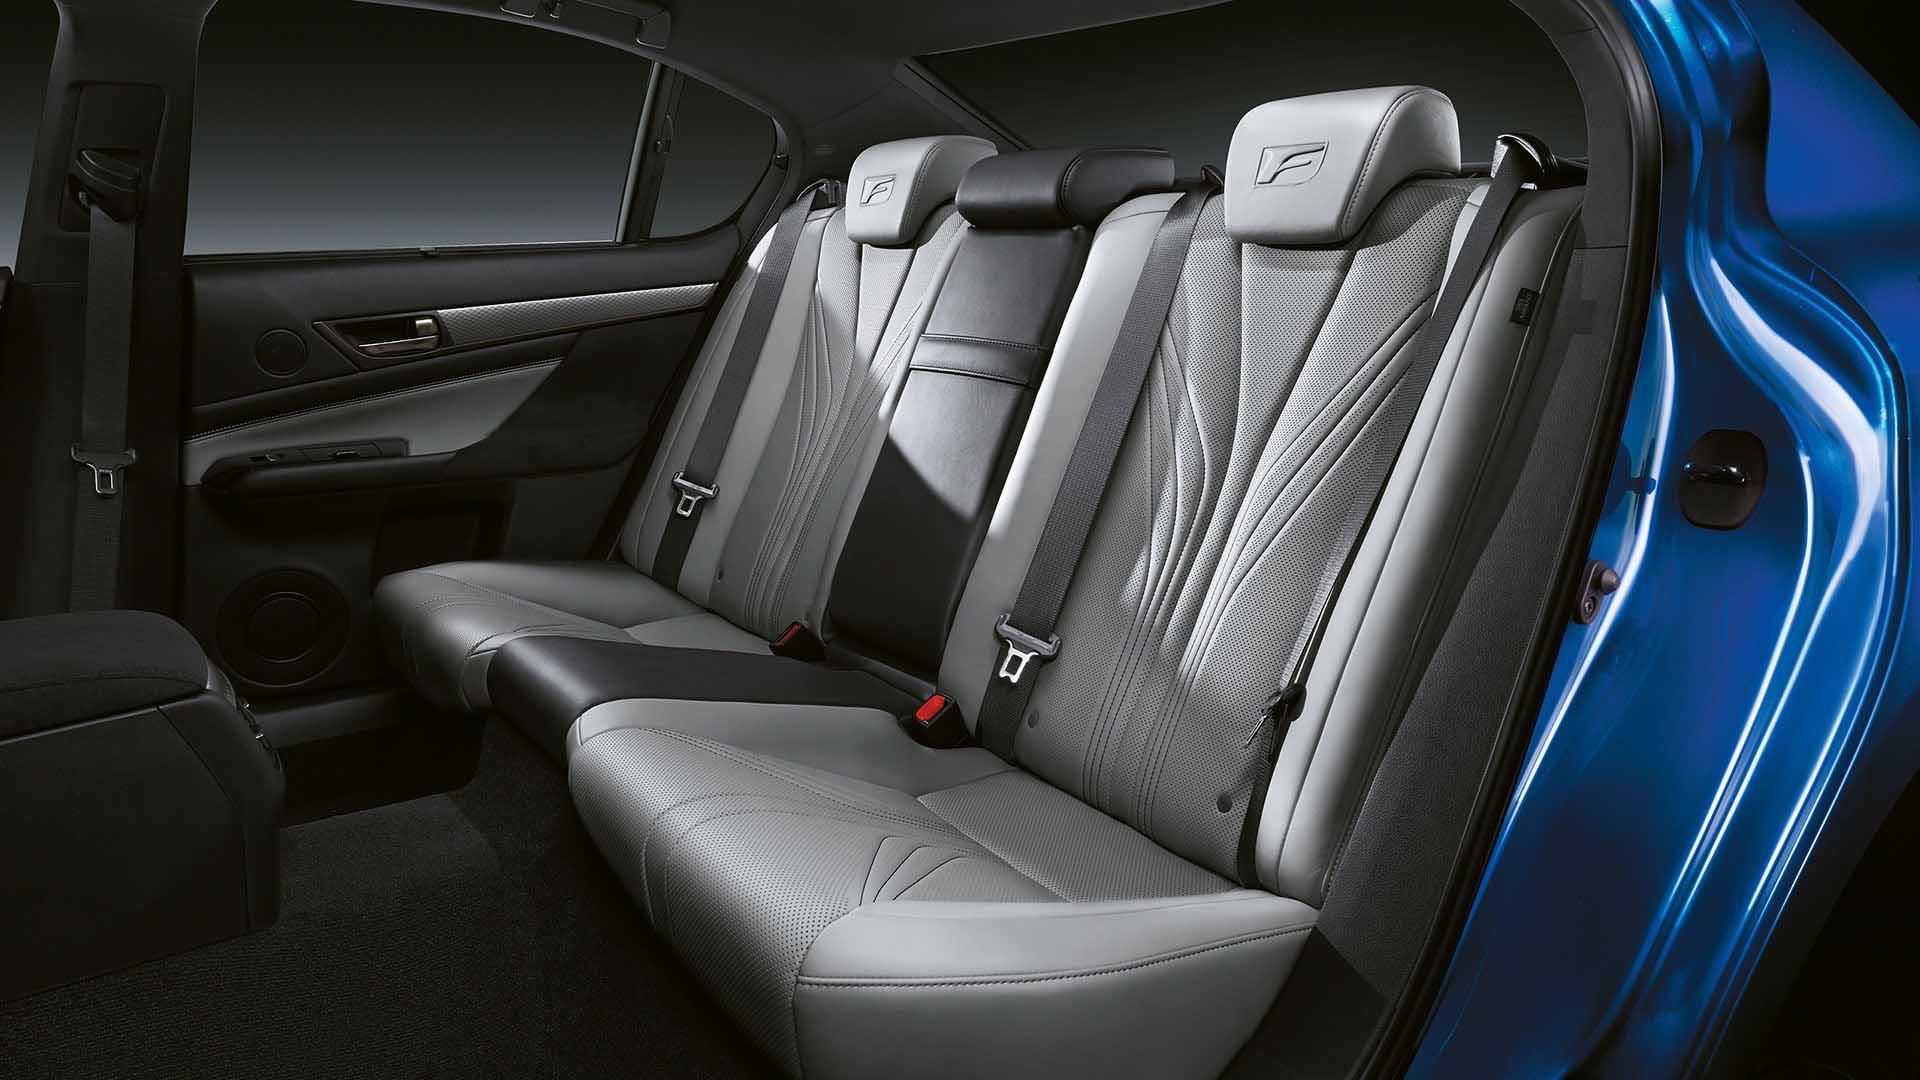 2017 lexus gs f features rear heated seats